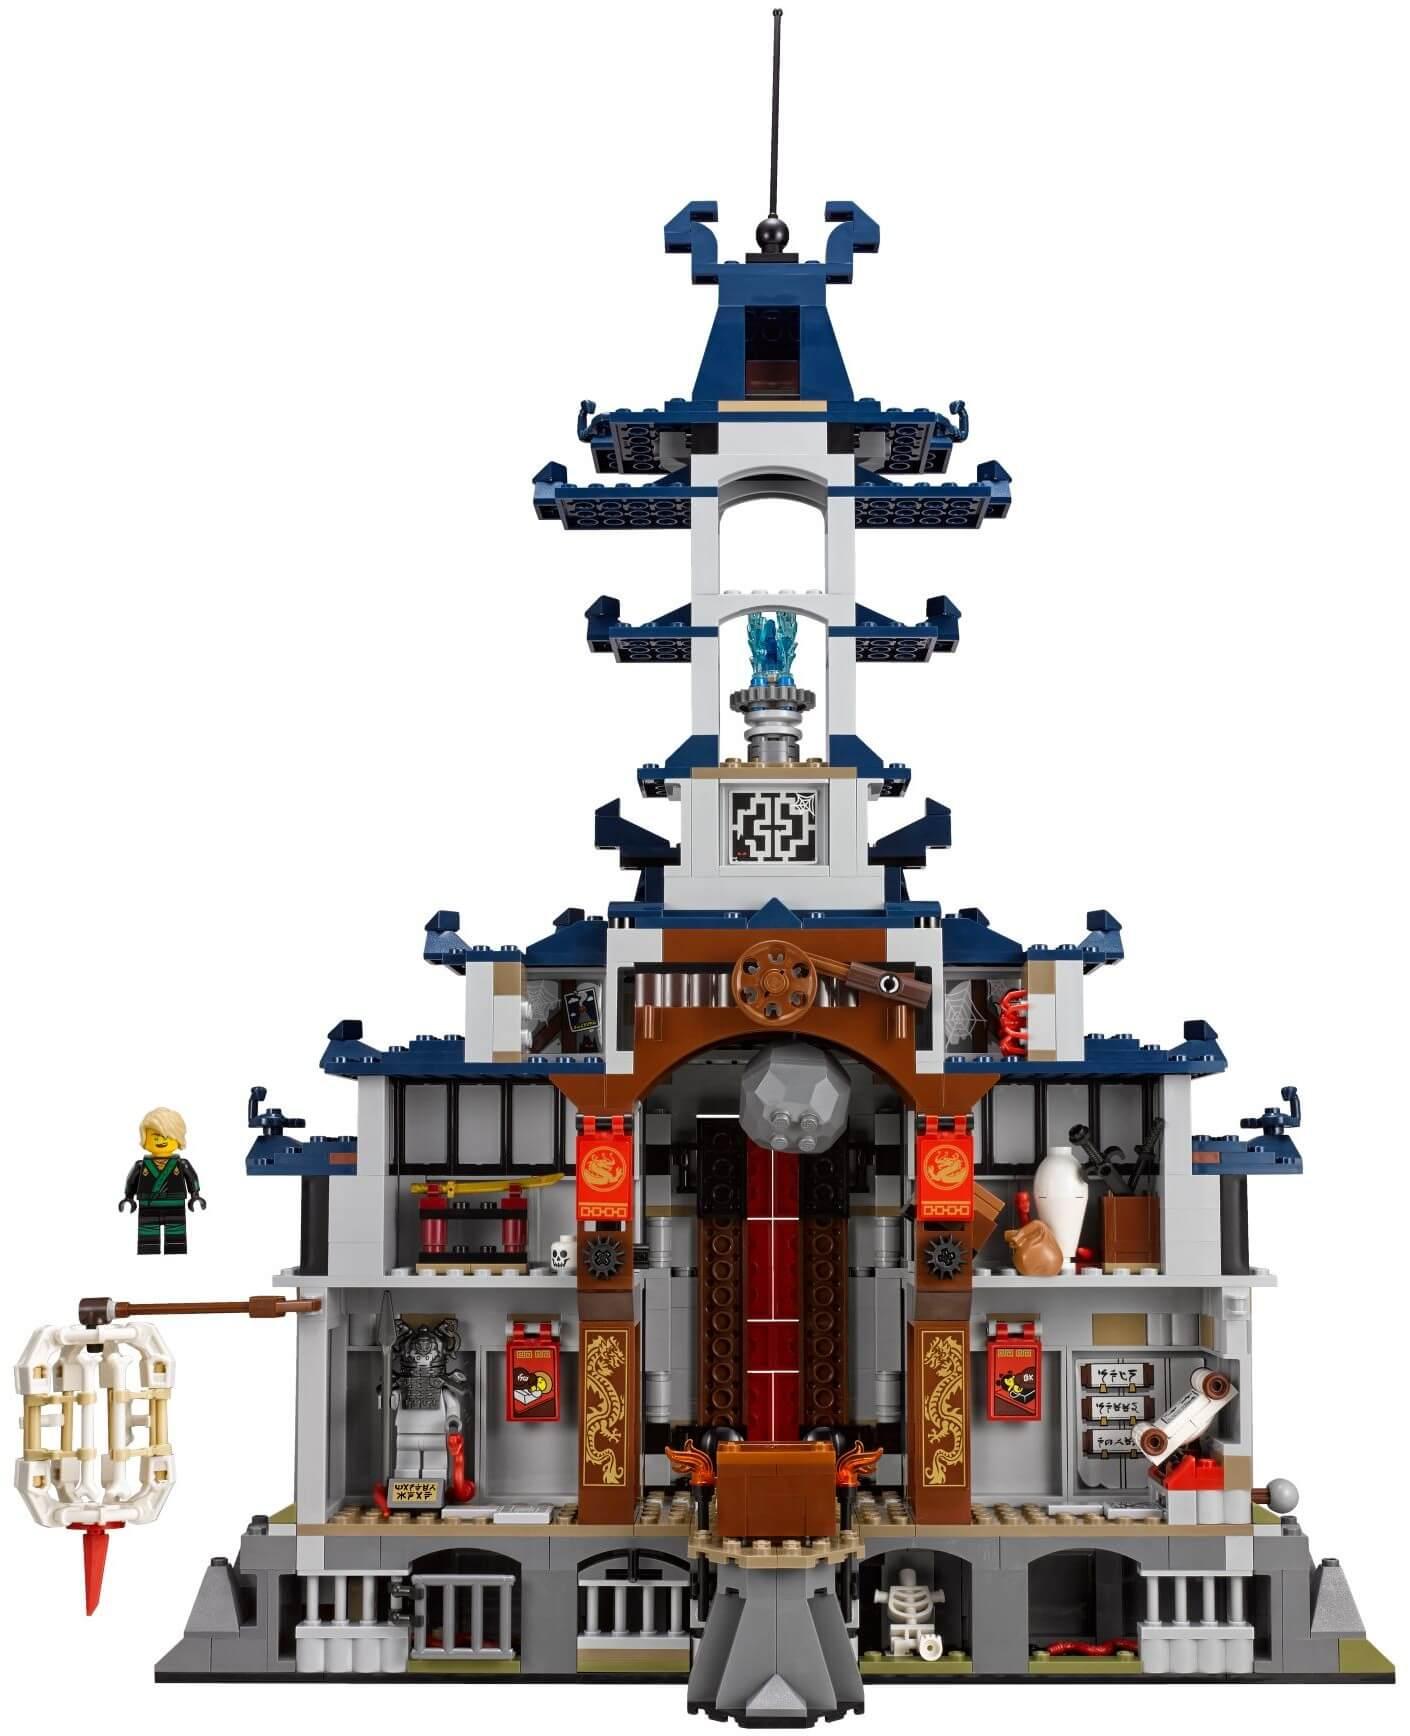 Mua đồ chơi LEGO 70617 - LEGO Ninjago 70617 - Ngôi Đền Vũ Khí Tối Thượng (LEGO Ninjago Temple of The Ultimate Ultimate Weapon)